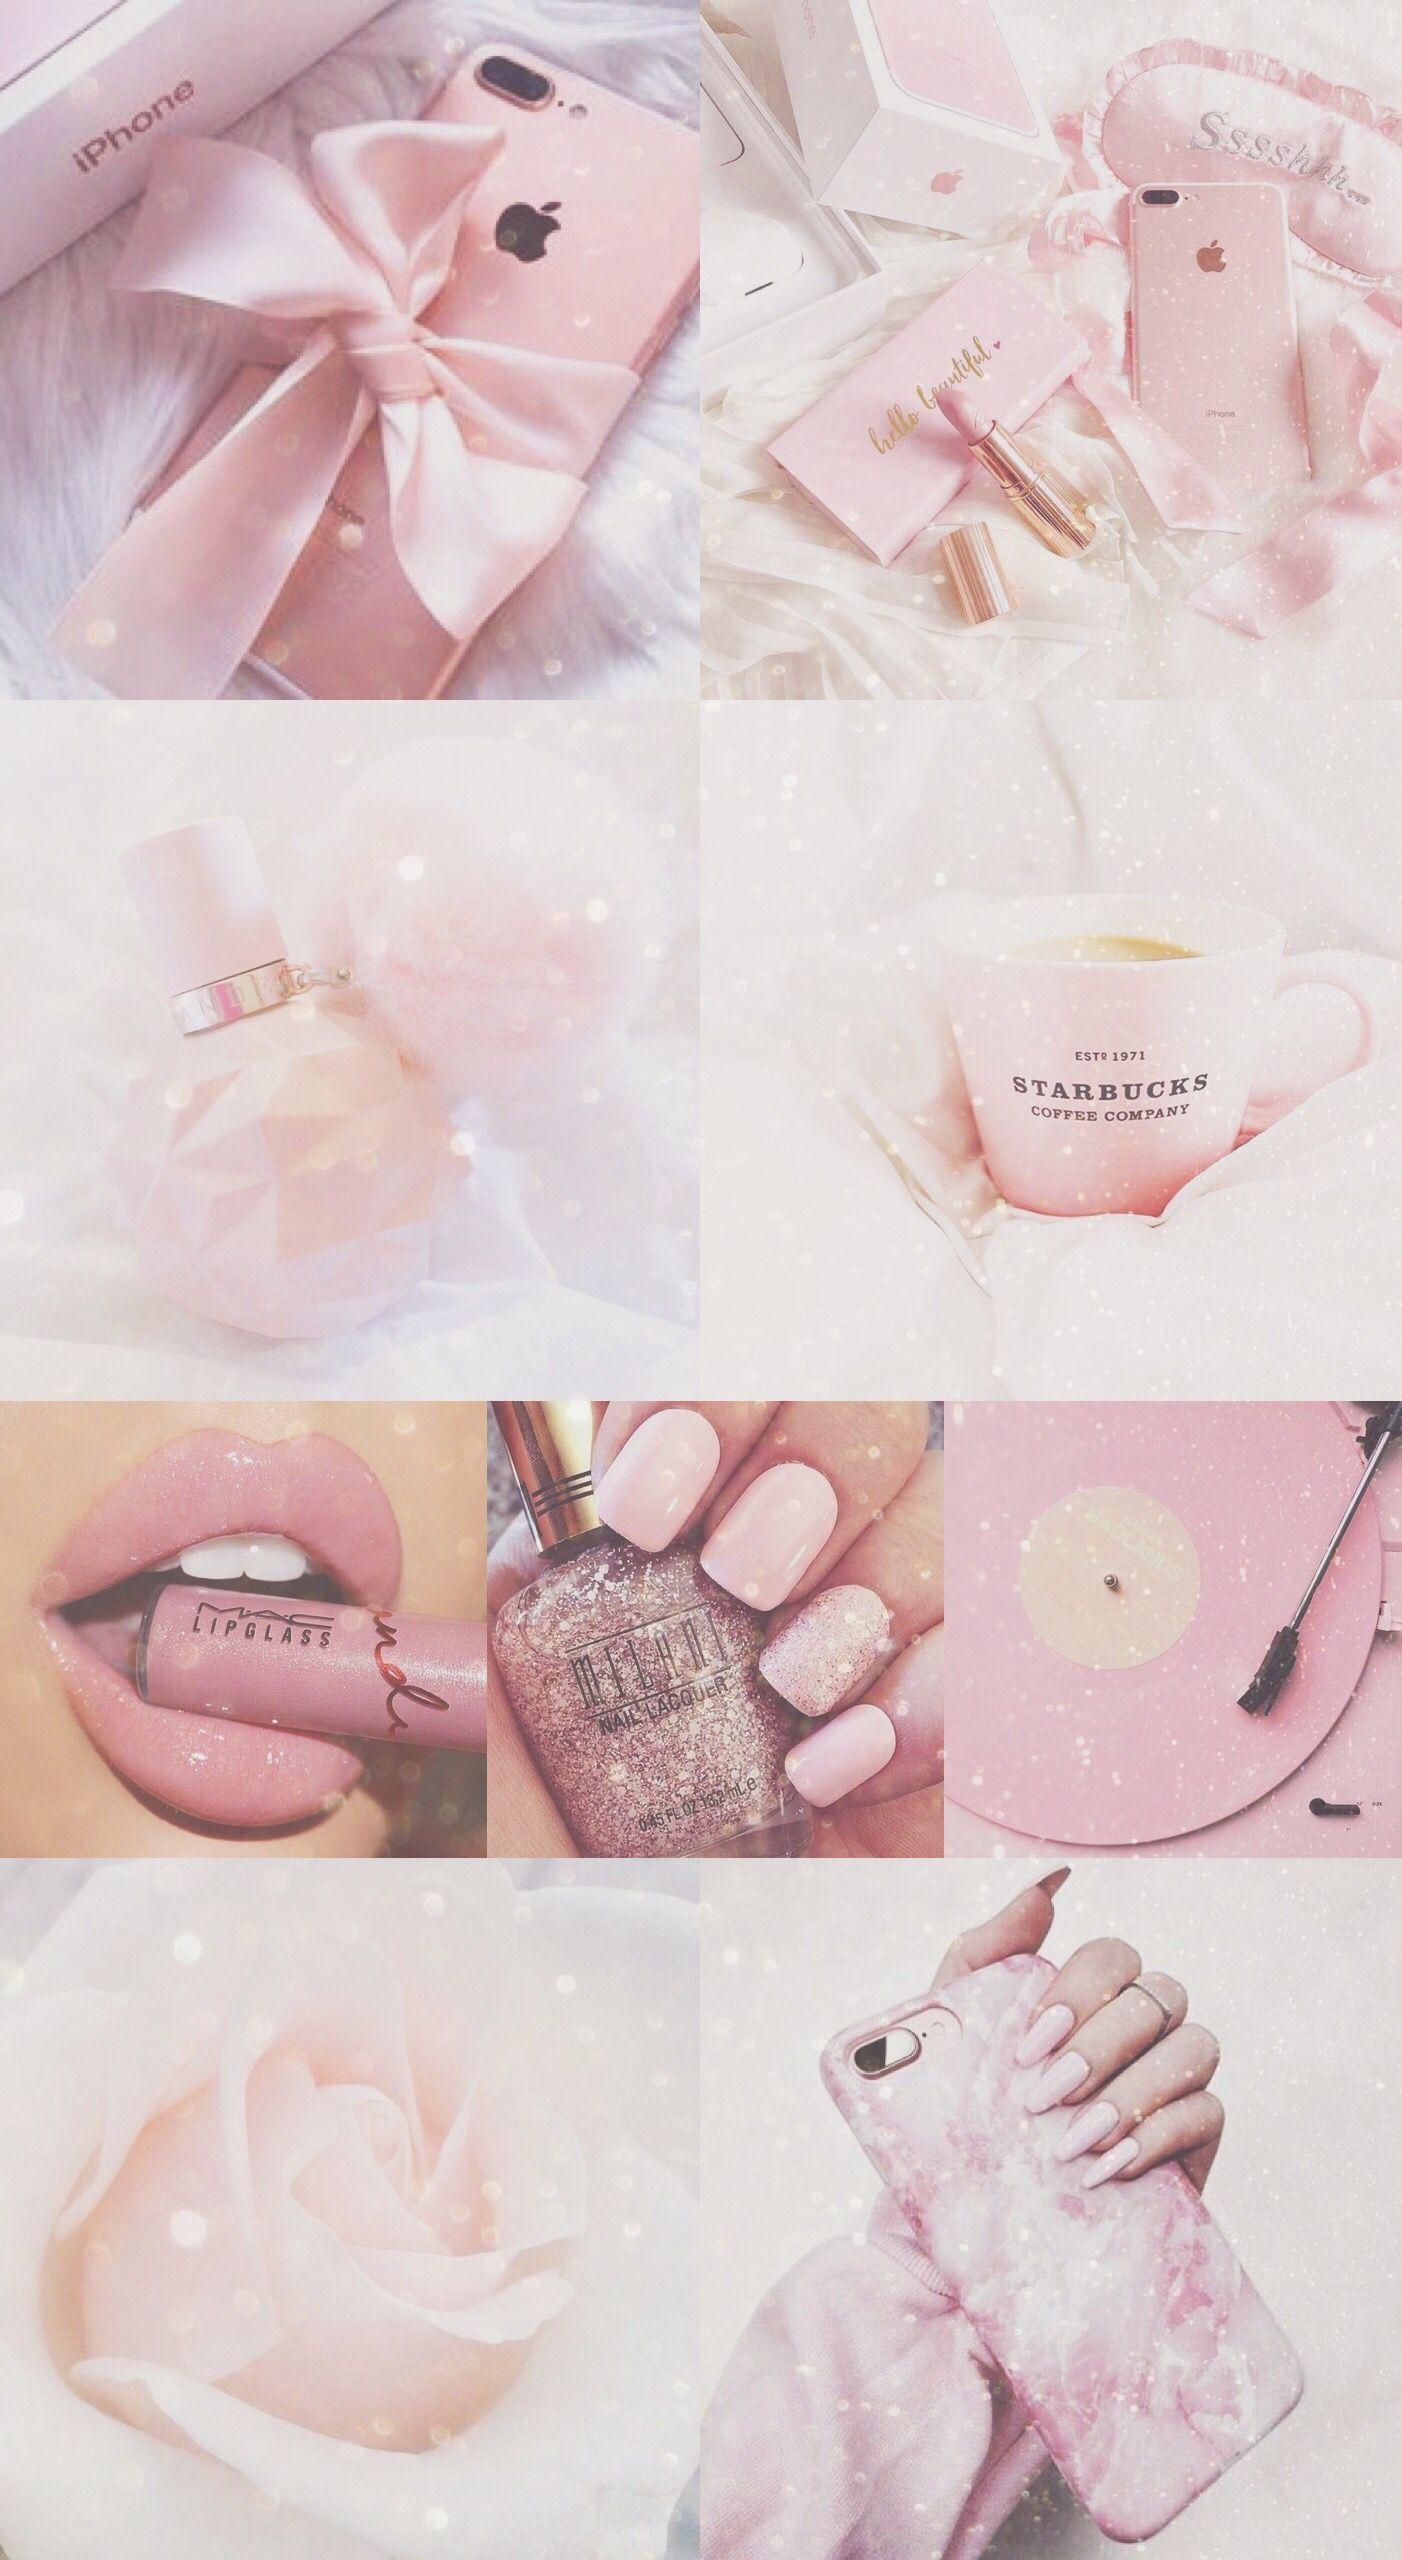 1920x1080 pink aesthetic desktop wallpaper tumblr>. Pastel Aesthetic Rose Wallpapers - Top Free Pastel ...